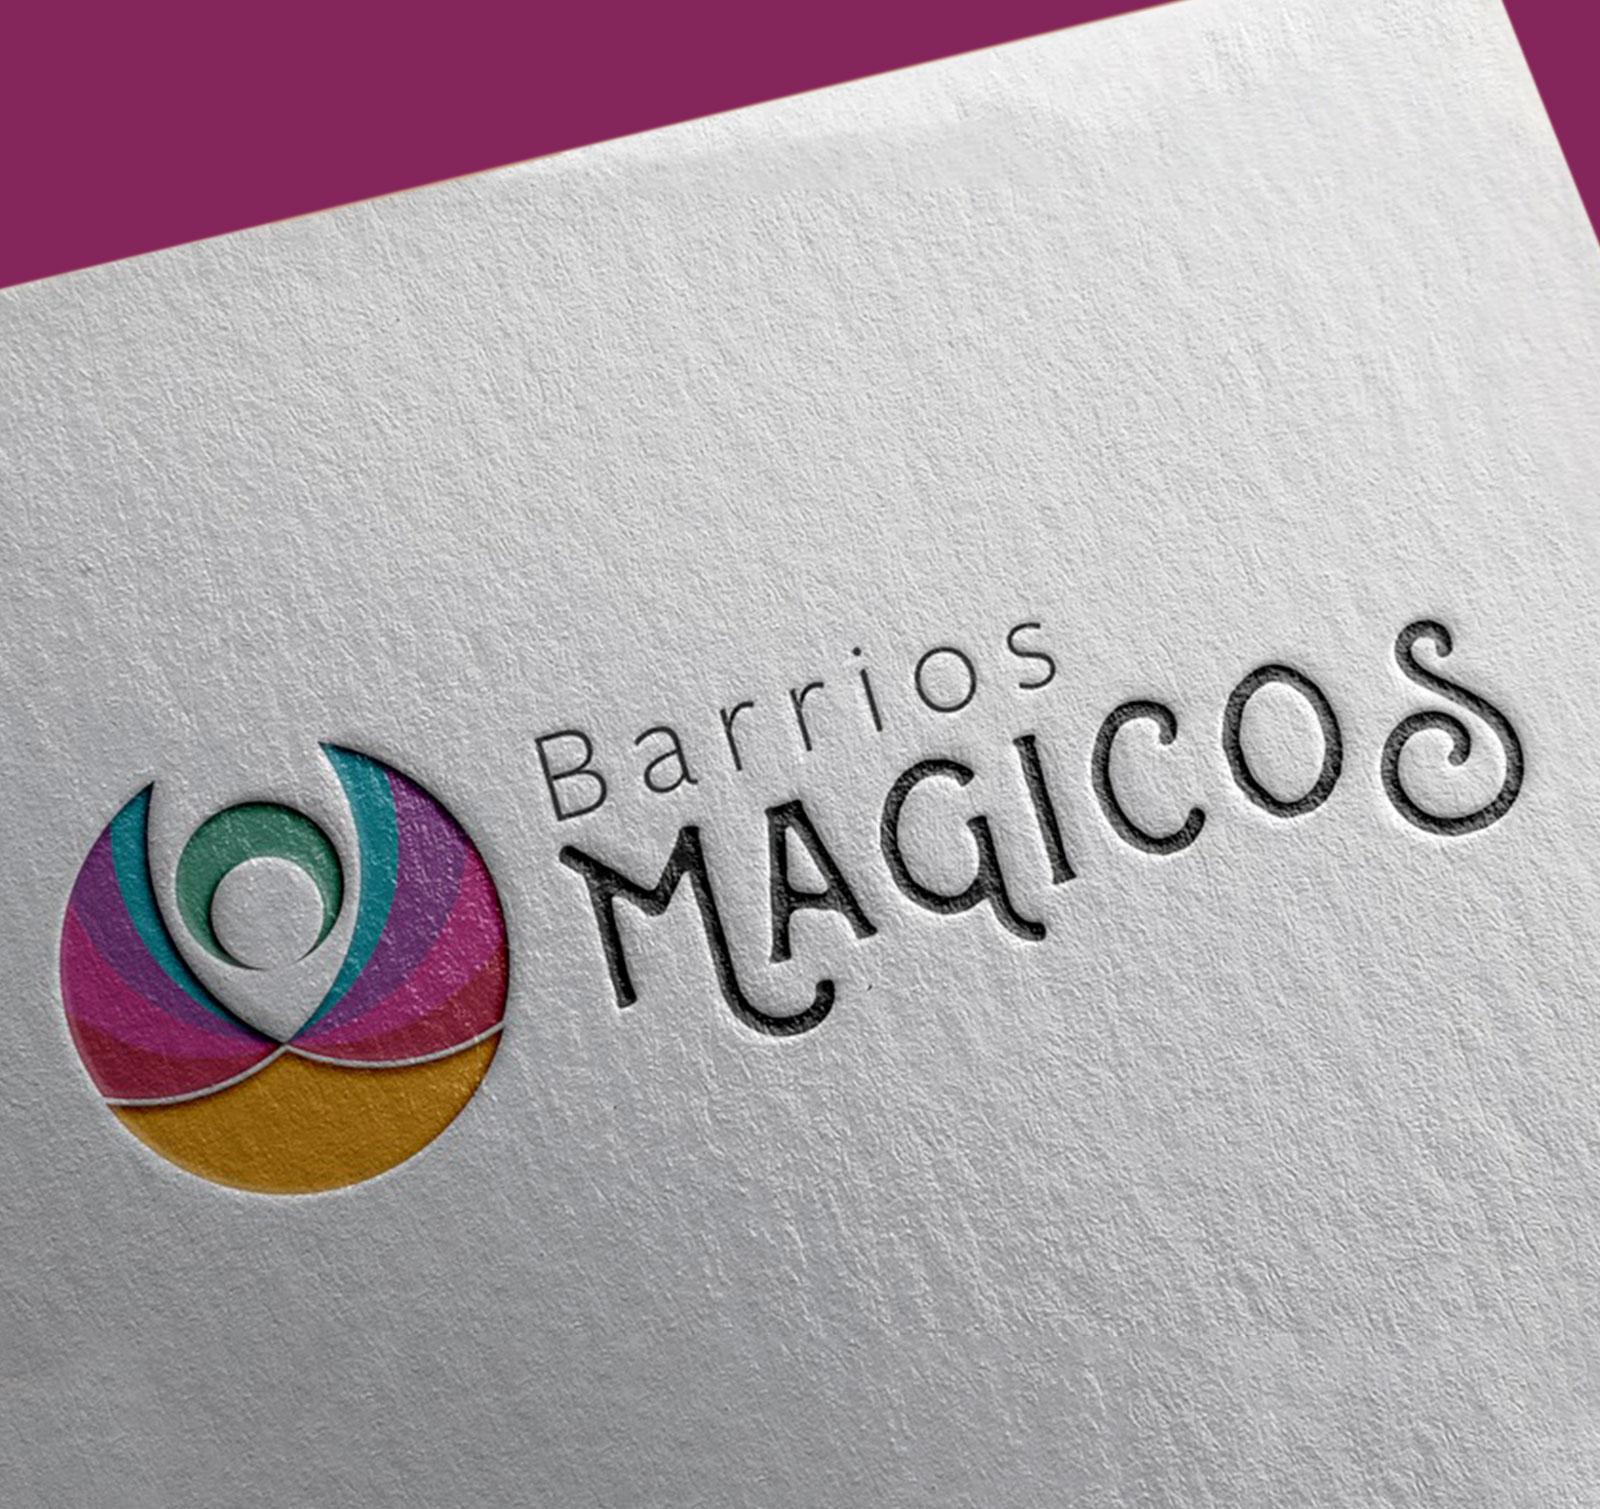 Identidad Corporativa Barrios Magicos